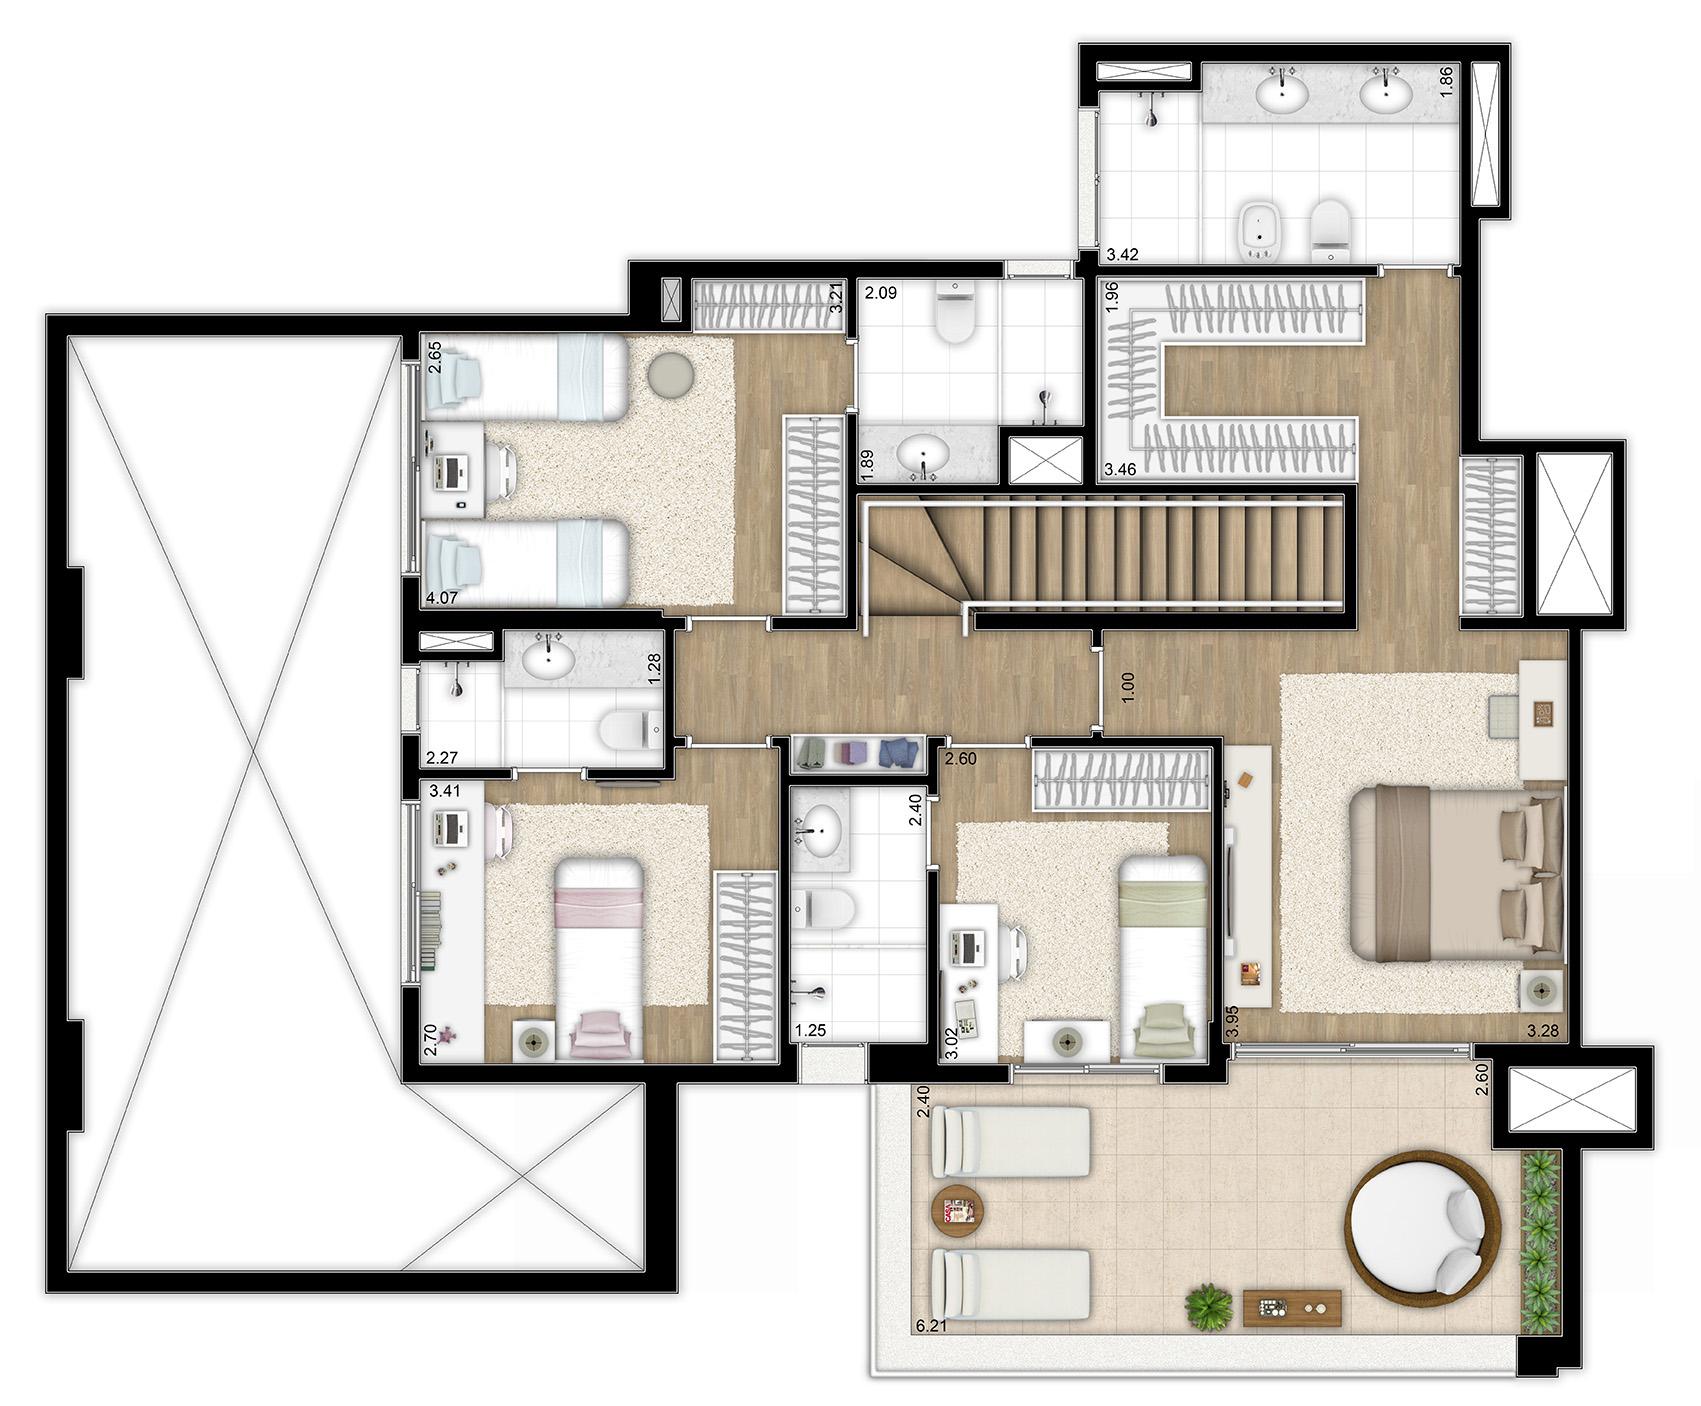 259m² - 4 suítes - Duplex superior